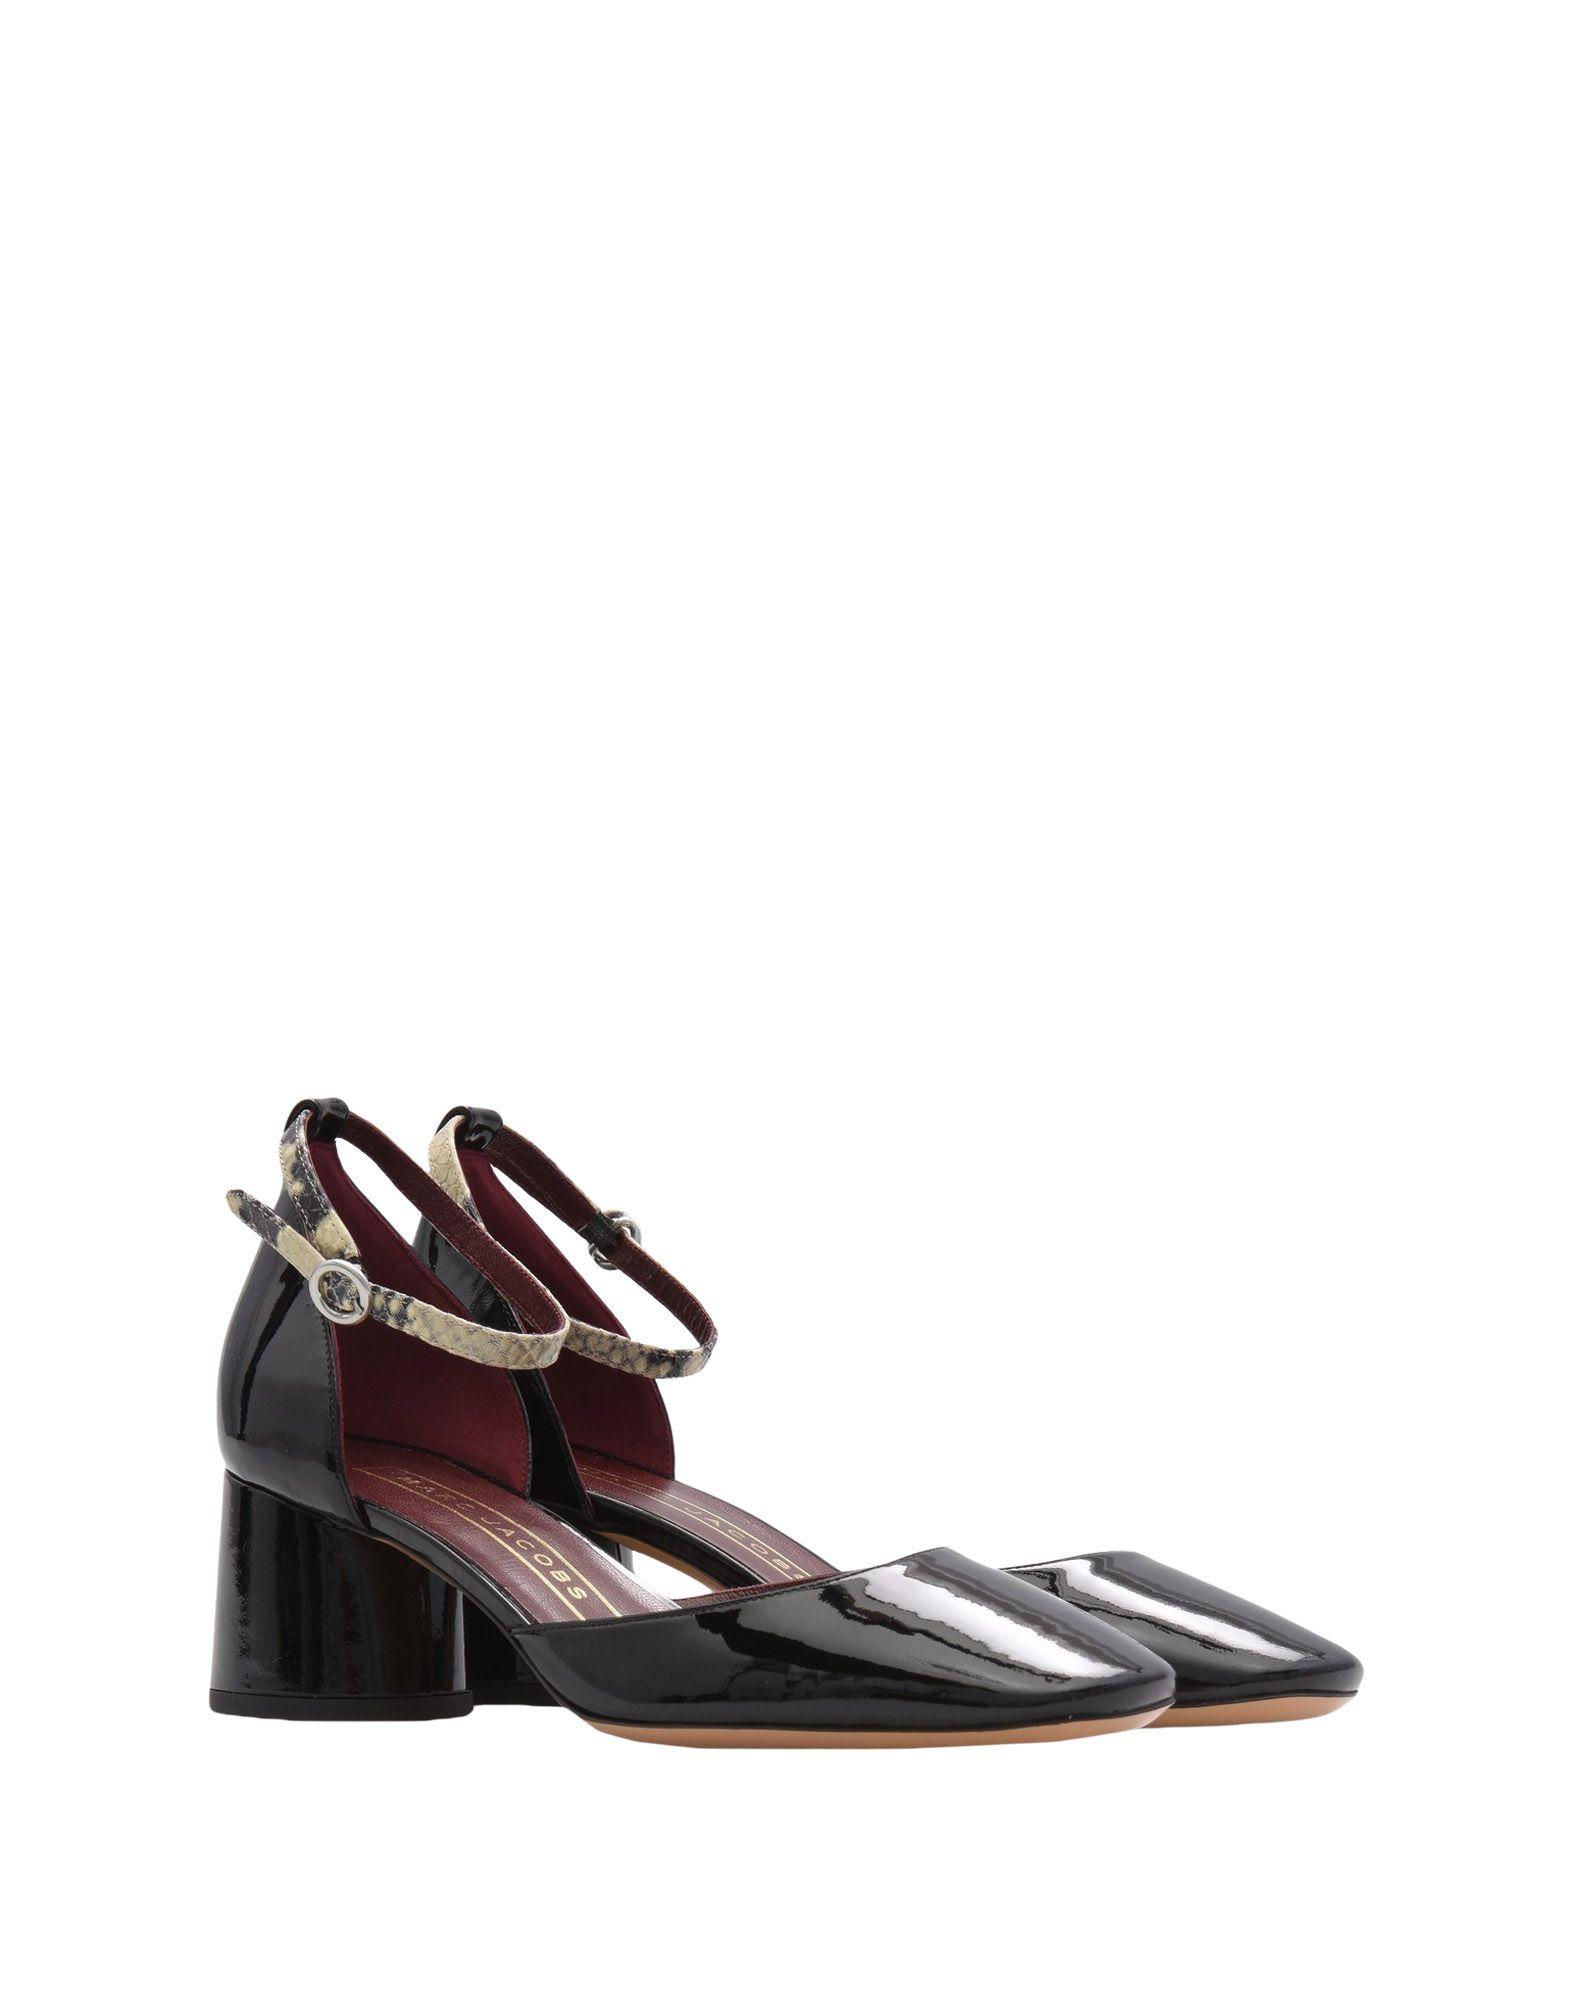 Marc Jacobs Pumps Schuhe Damen  11486019IN Beliebte Schuhe Pumps 336f3e